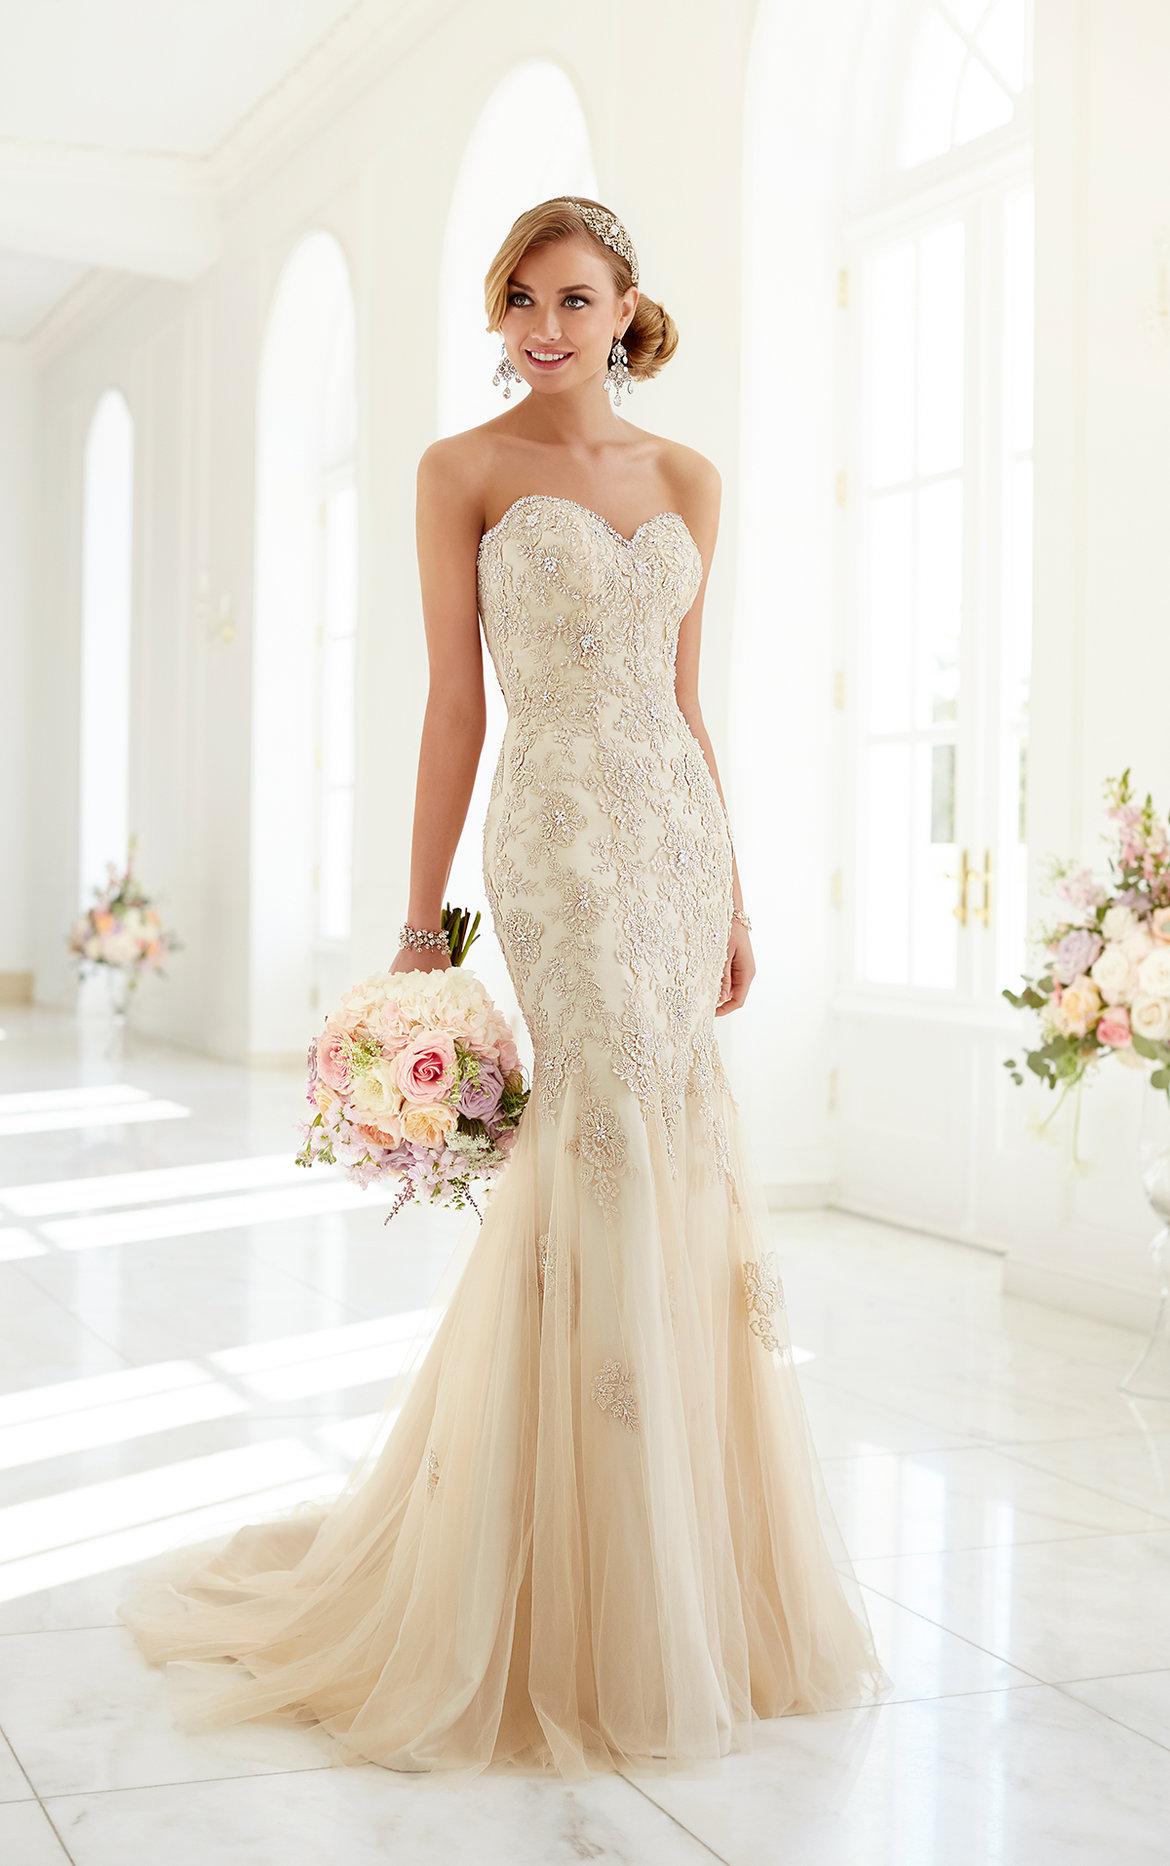 top wedding gowns most popular wedding dresses stella york wedding gown style